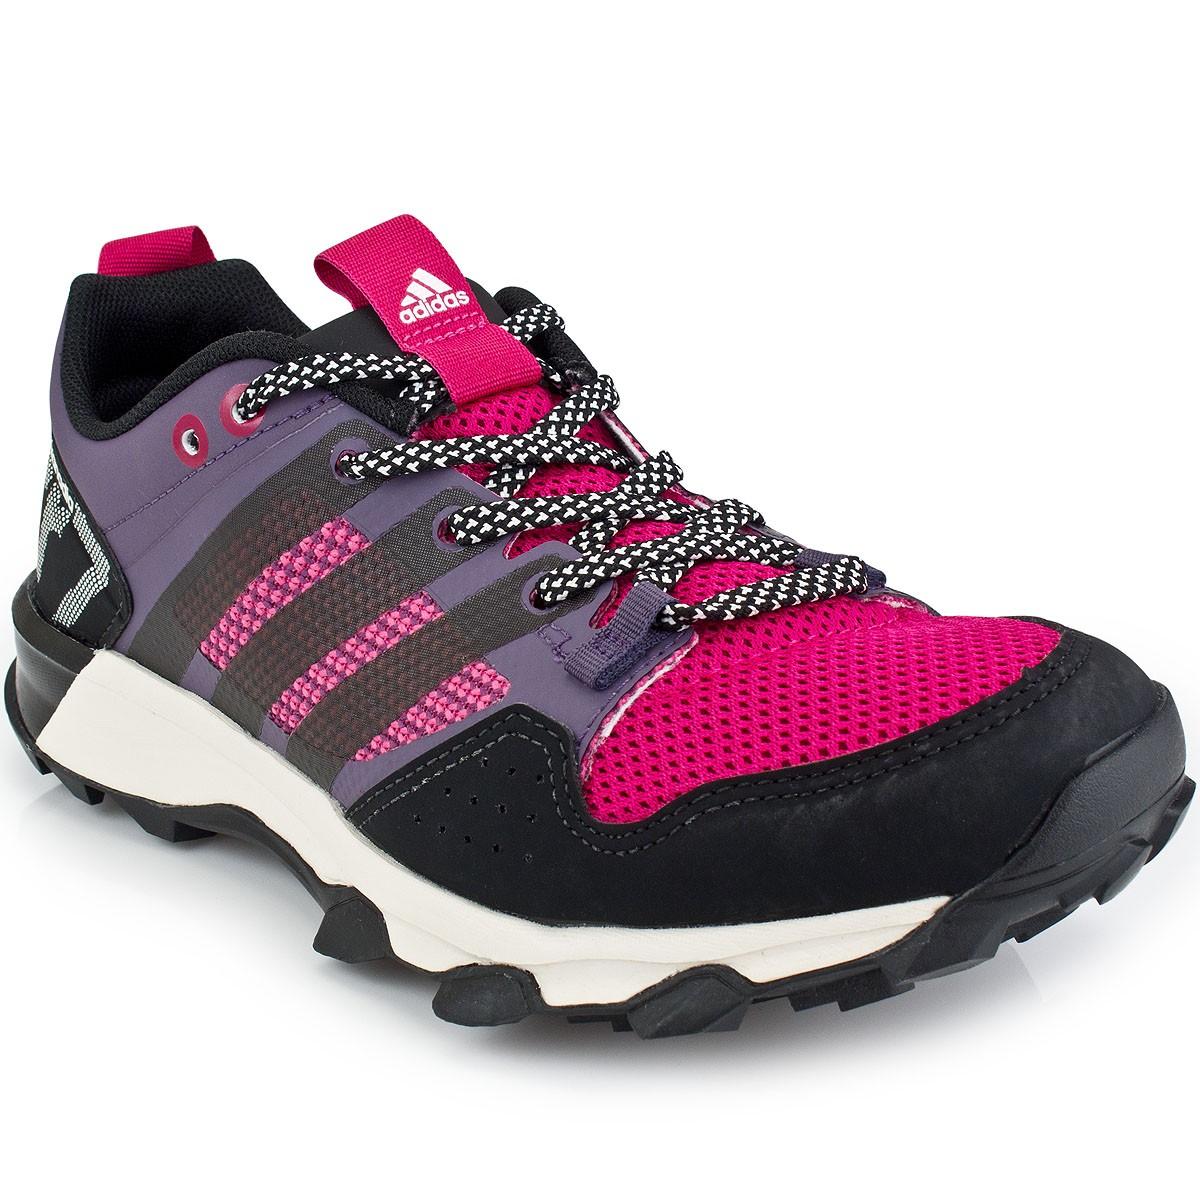 49ab51a871 Tênis Adidas Kanadia 7 TR W